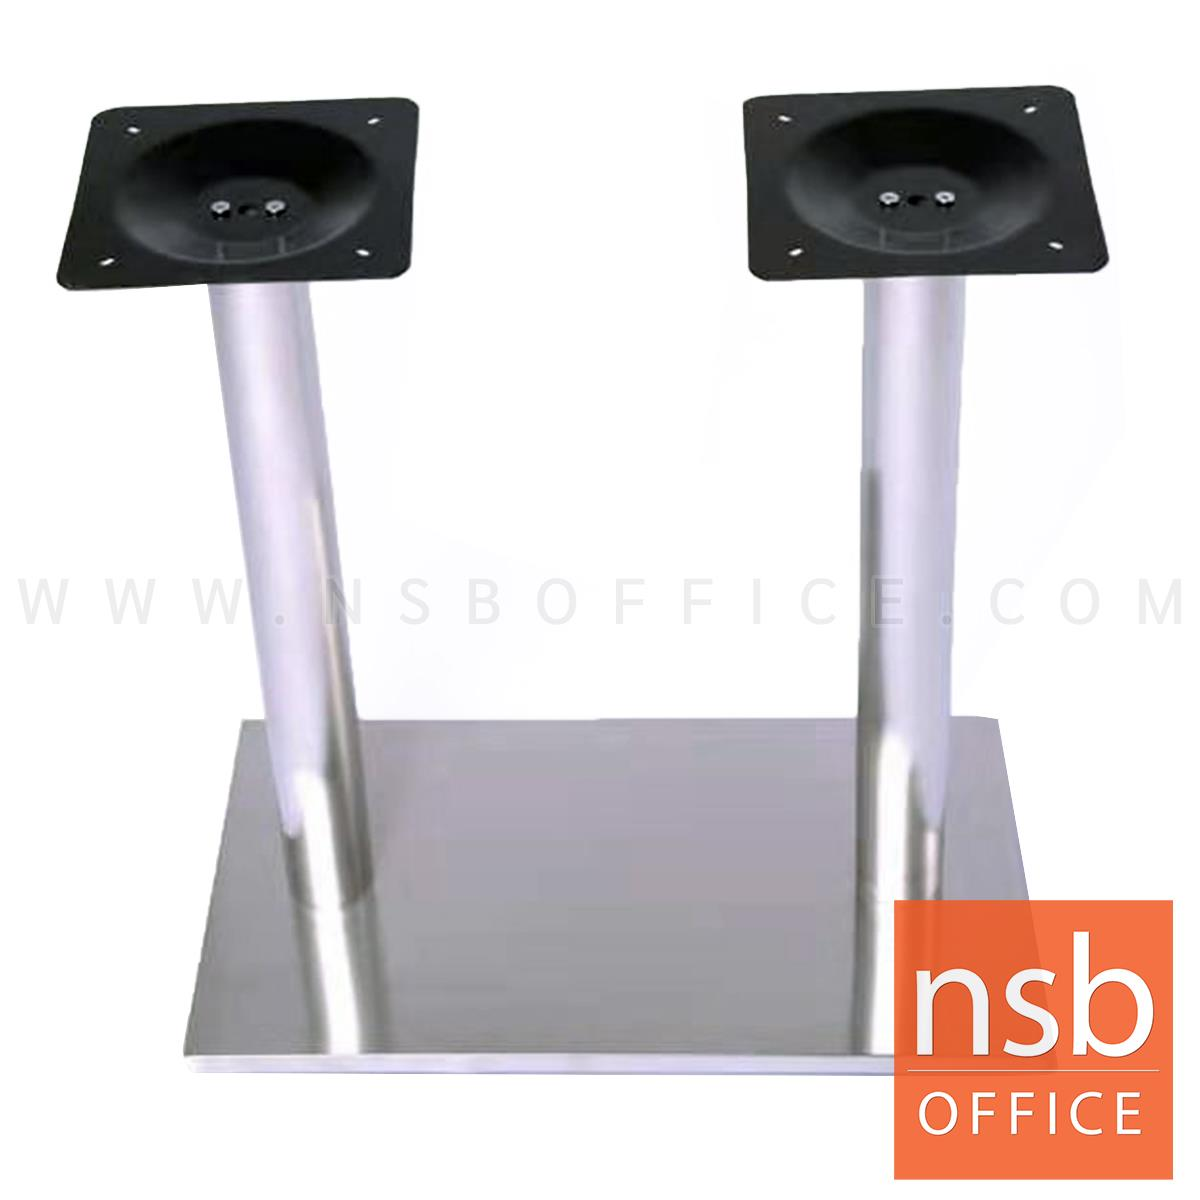 J02A010:ขาโต๊ะบาร์สี่เหลี่ยมแผ่นเรียบ รุ่น Huffle (ฮัฟเฟิล)  สเตนเลส